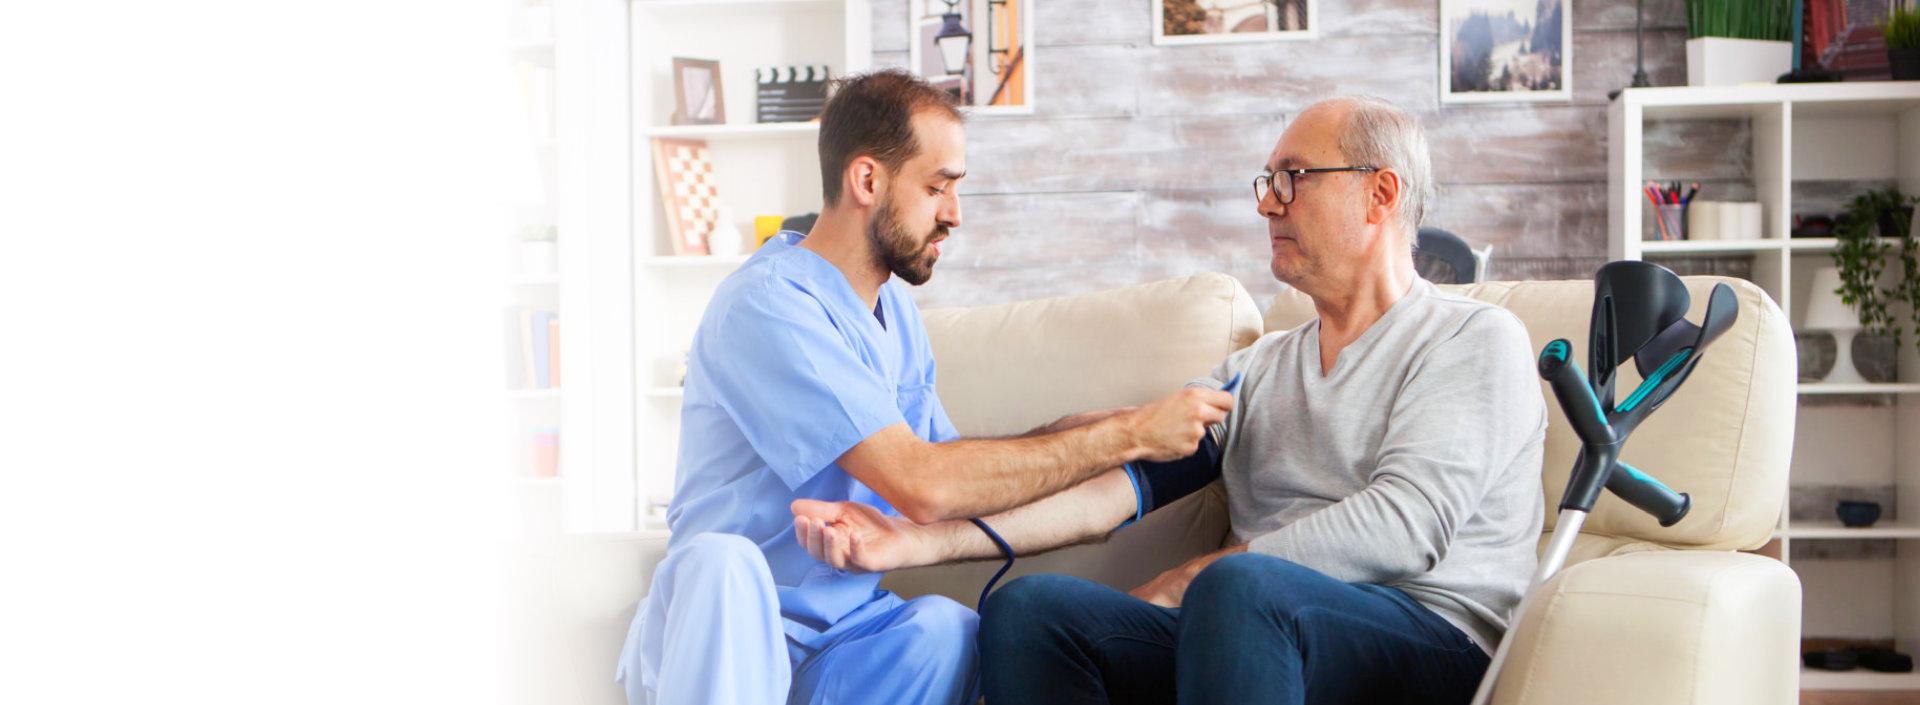 caregiver serving senior man